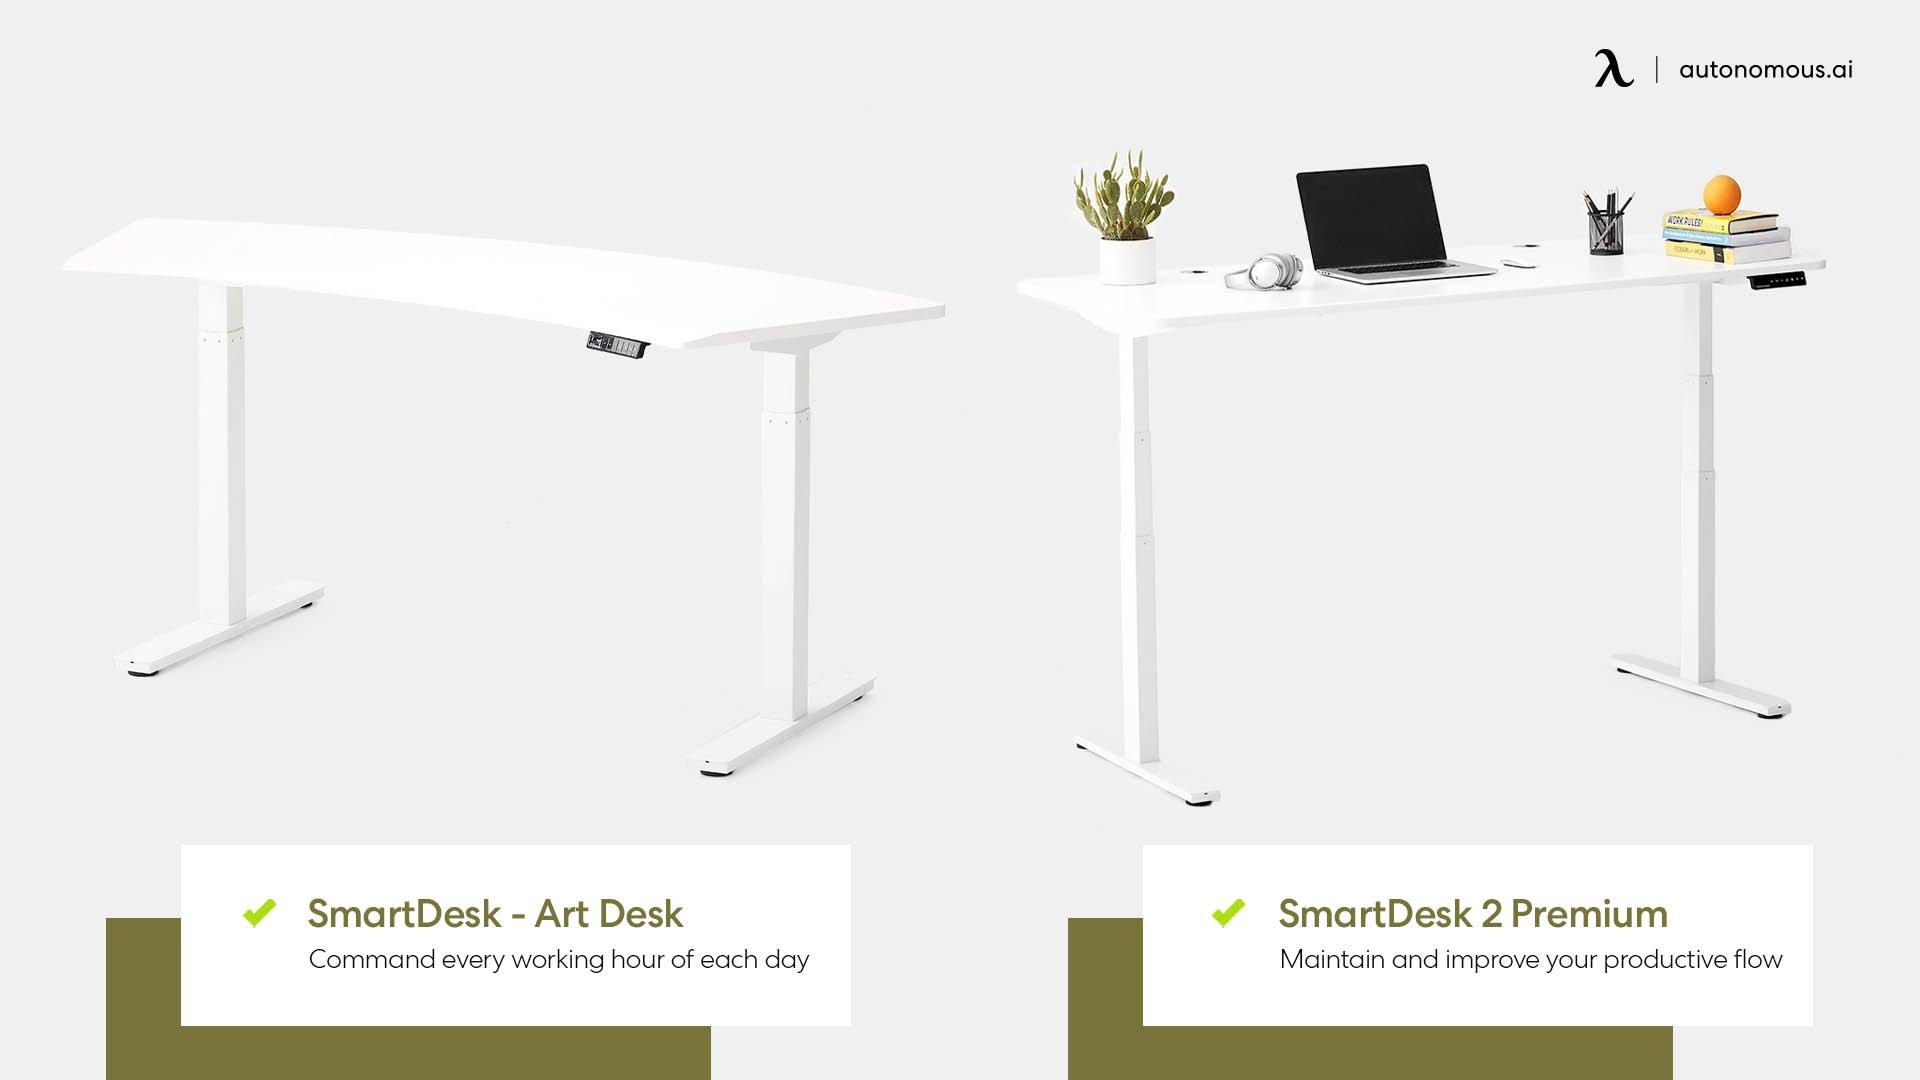 Photo of Art-Desk, Premium Standing desk